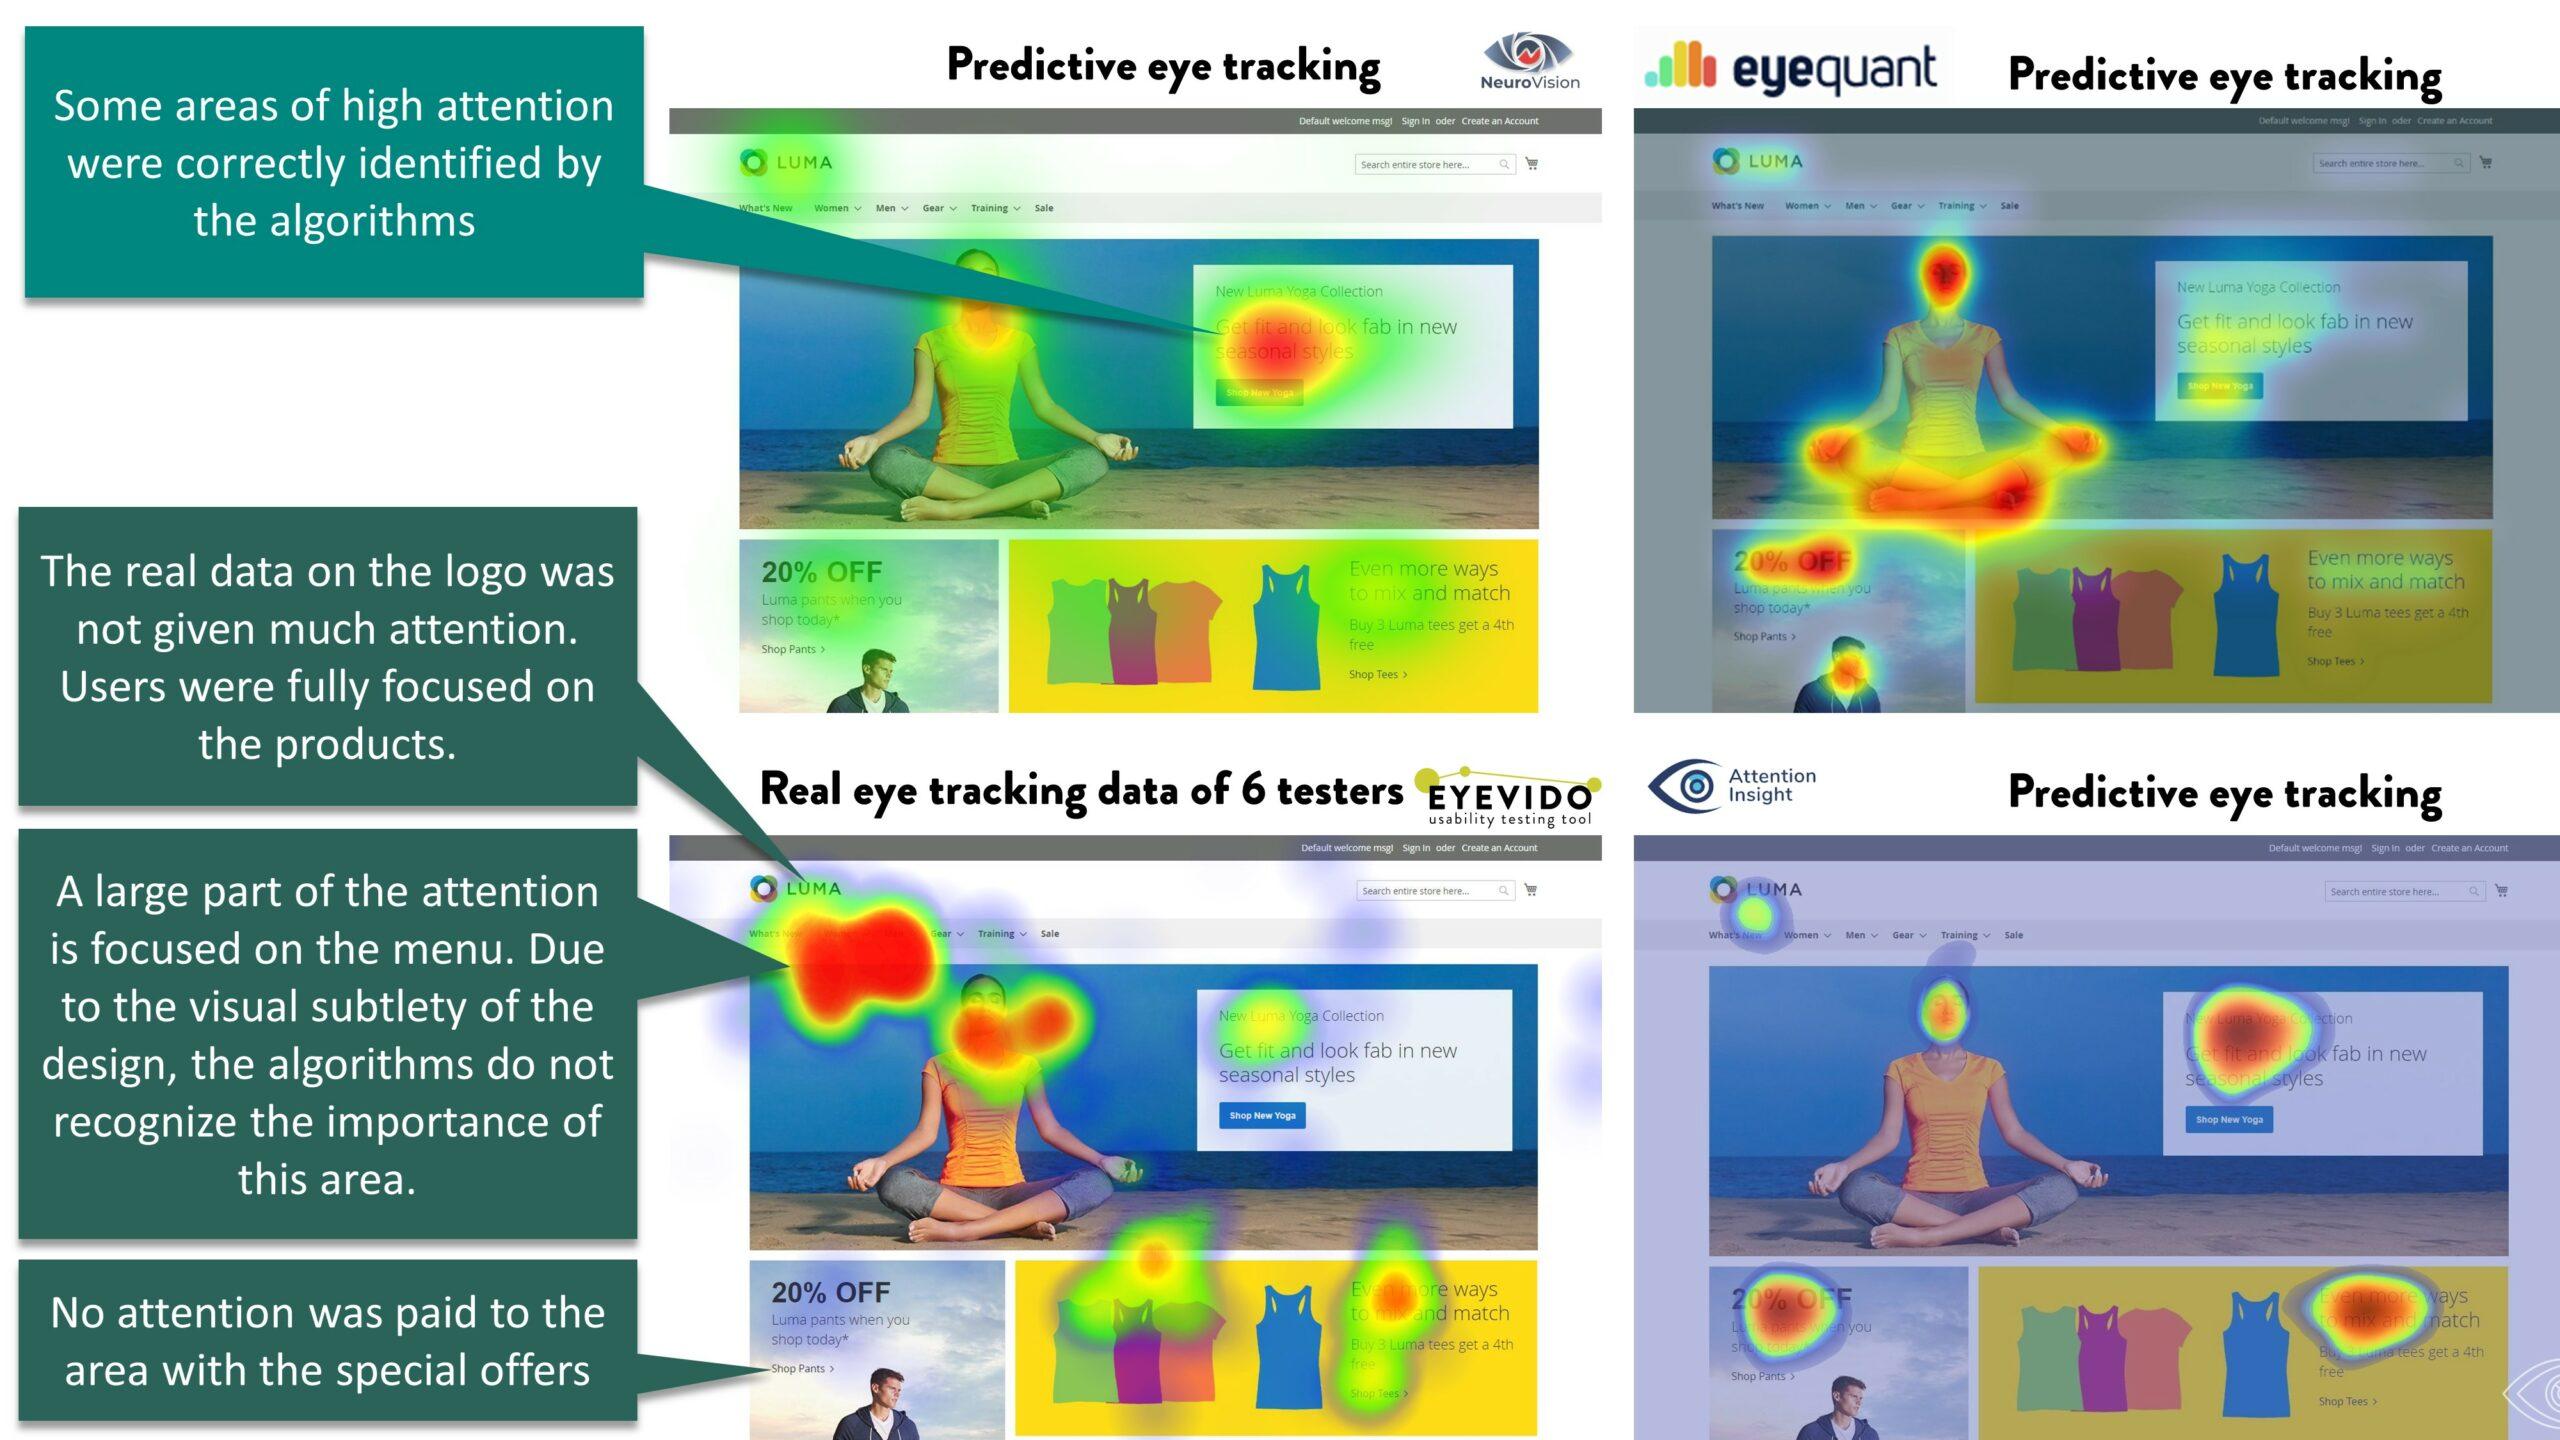 EYEVIDO predictive eye tracking real eye tracking